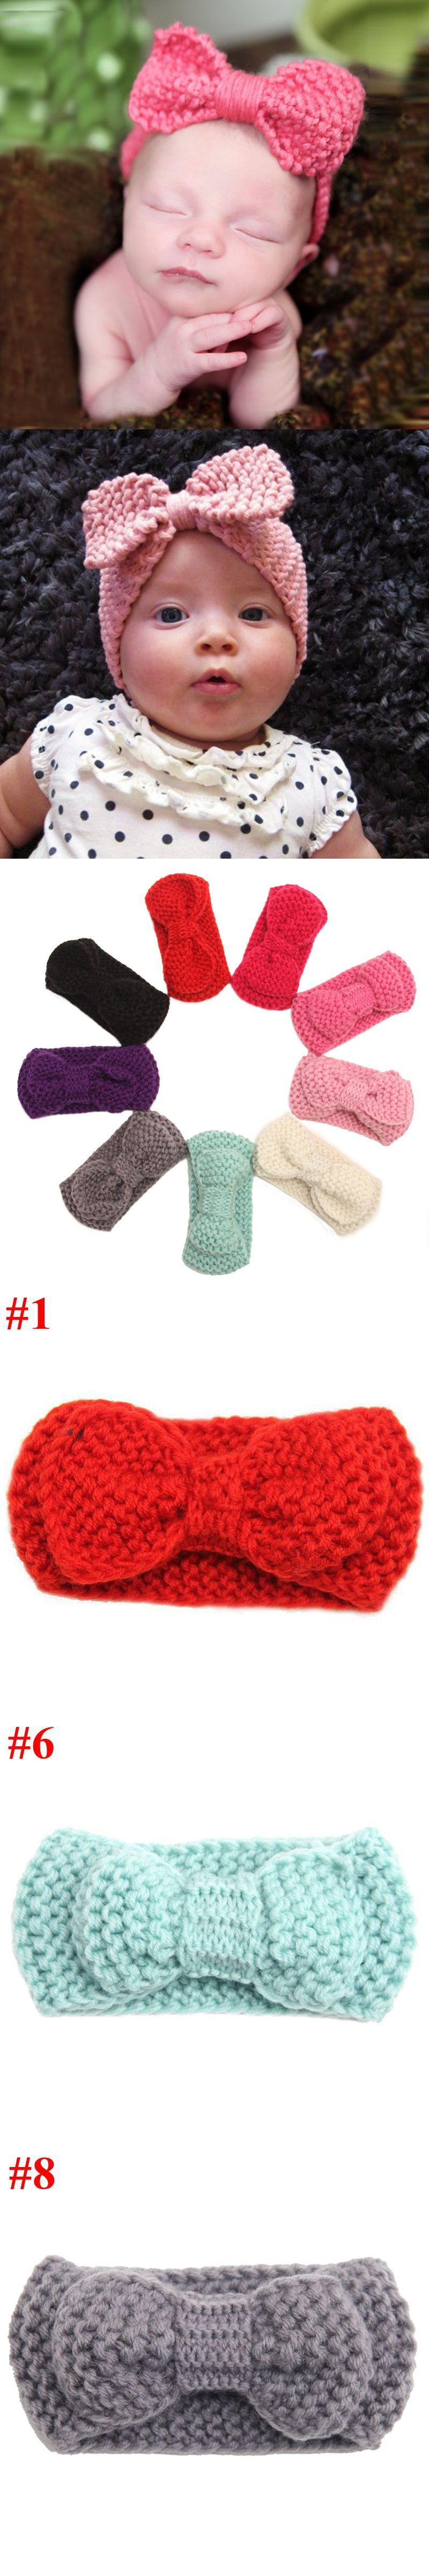 Cute Baby Crochet Headband Infant Girls Hair Accessories Ear Warmers ...